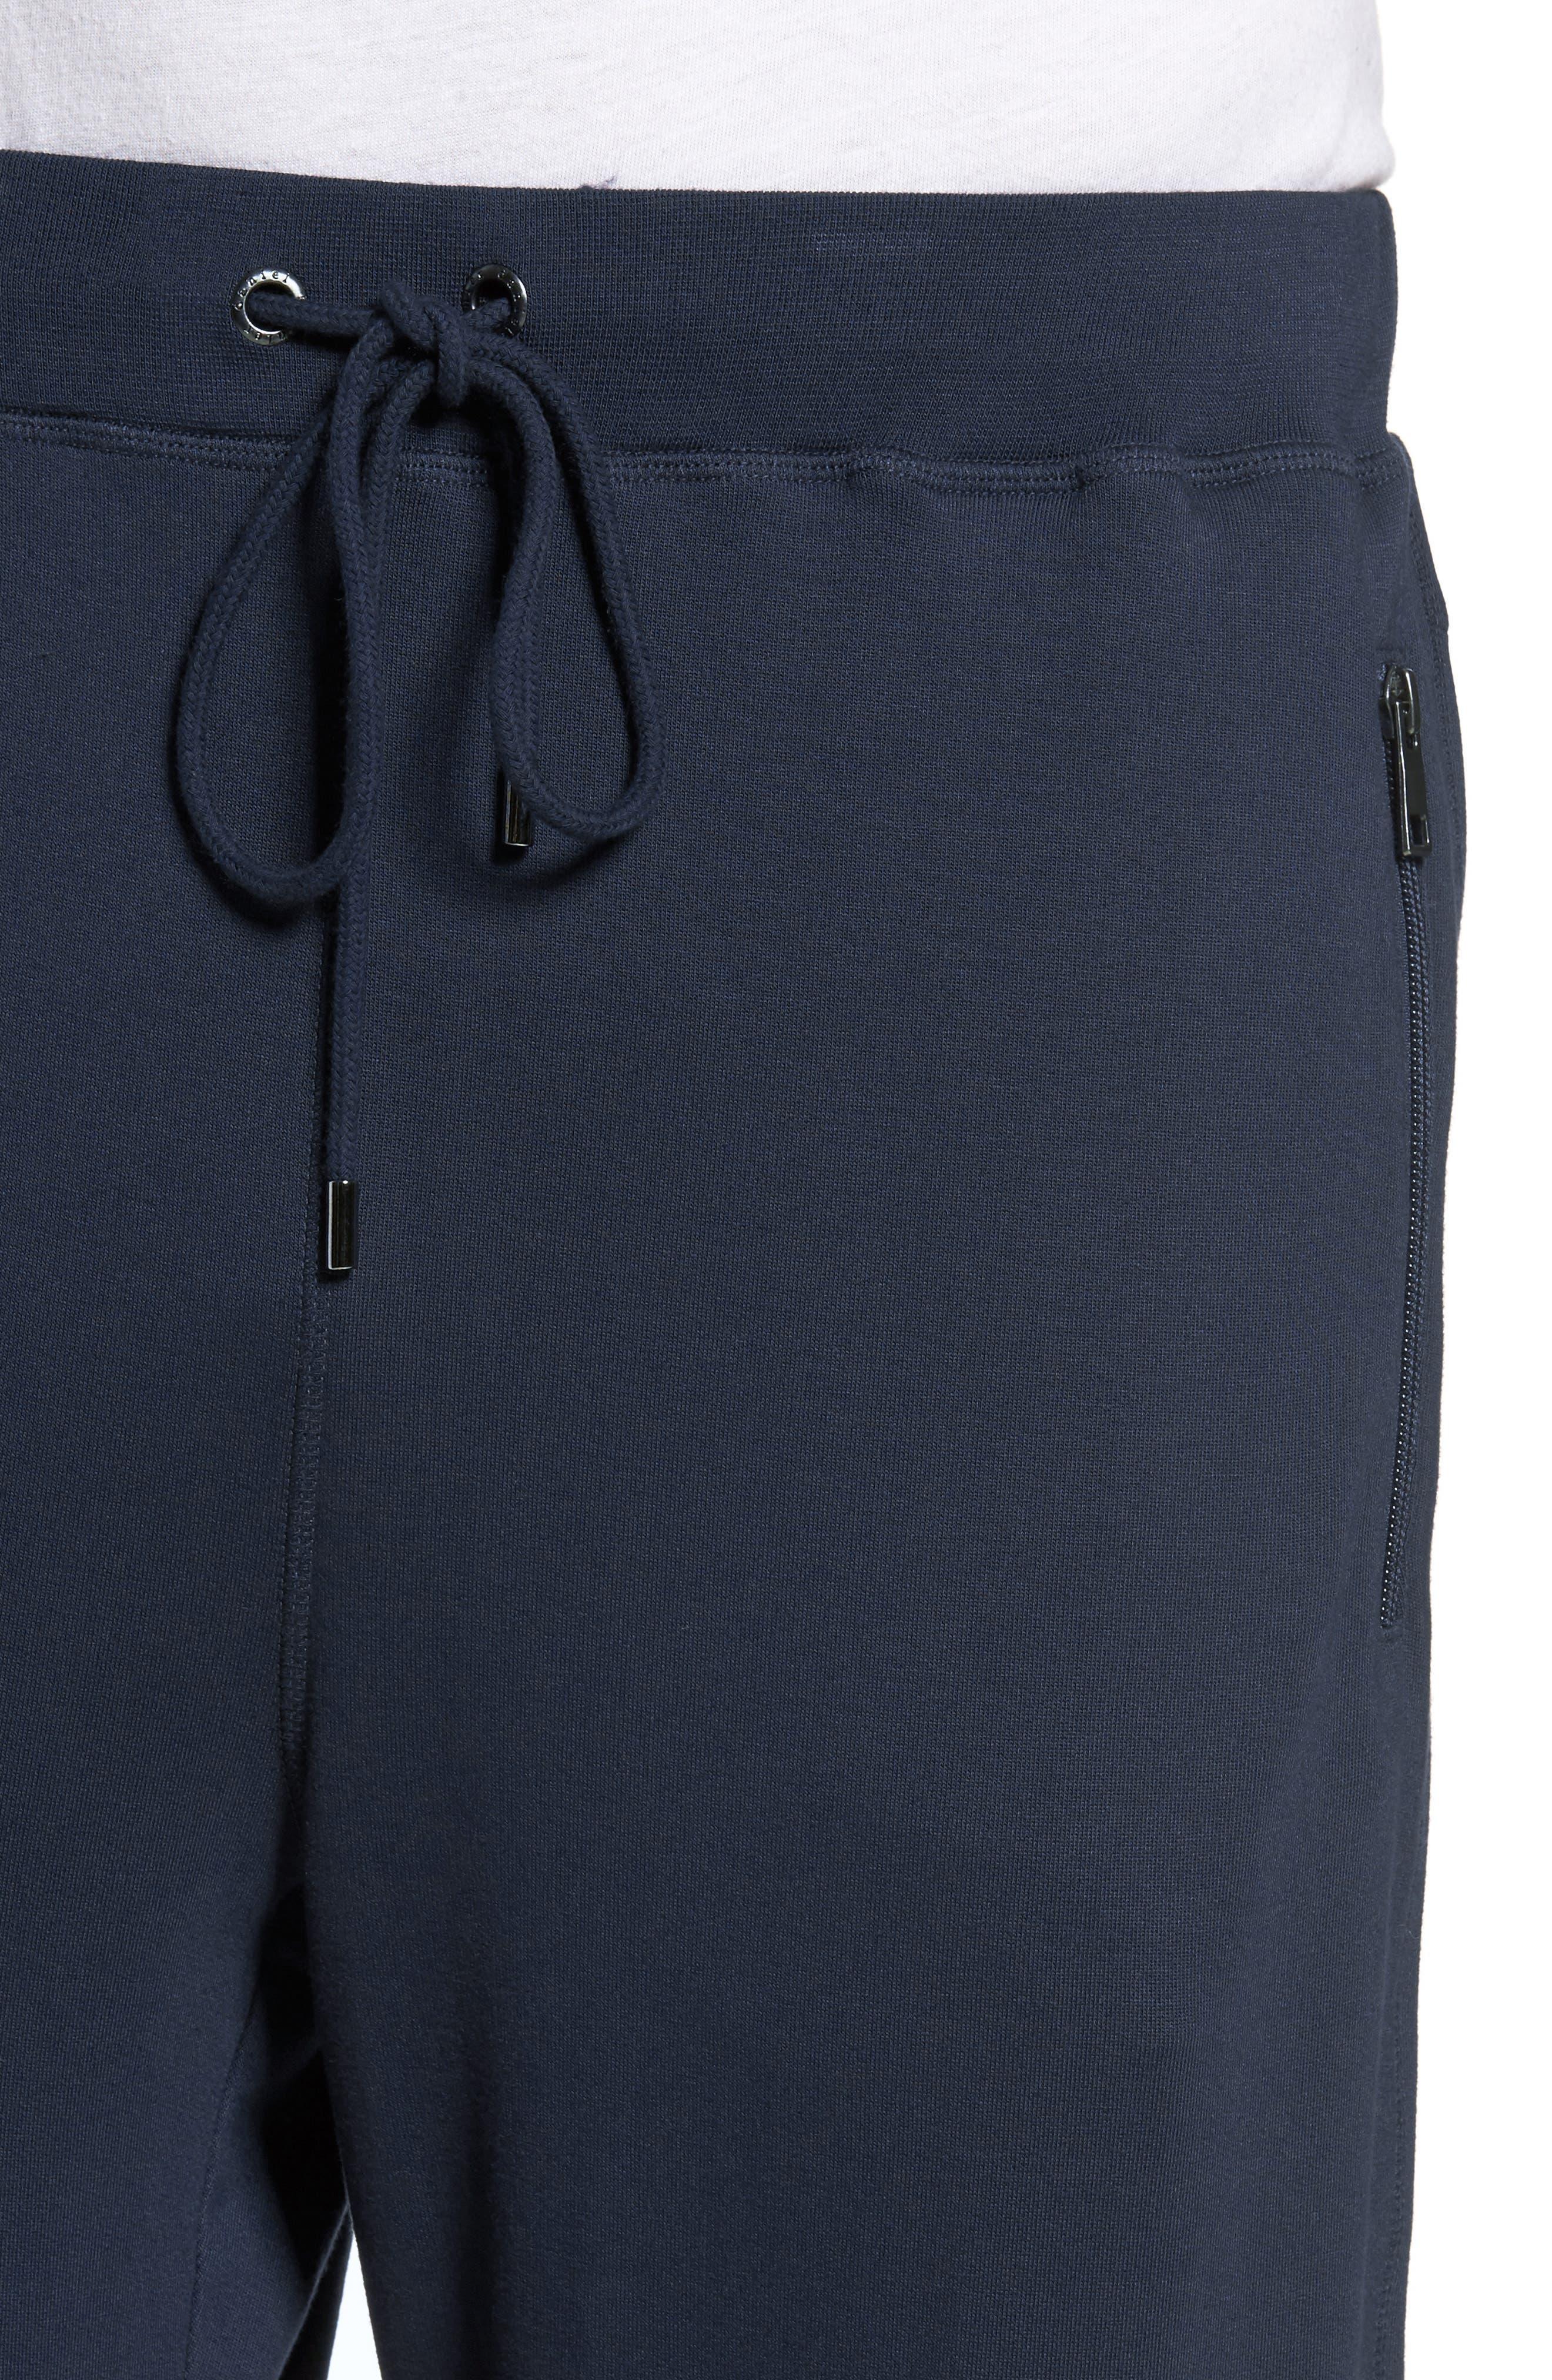 Modal Blend Lounge Pants,                             Alternate thumbnail 4, color,                             Ink